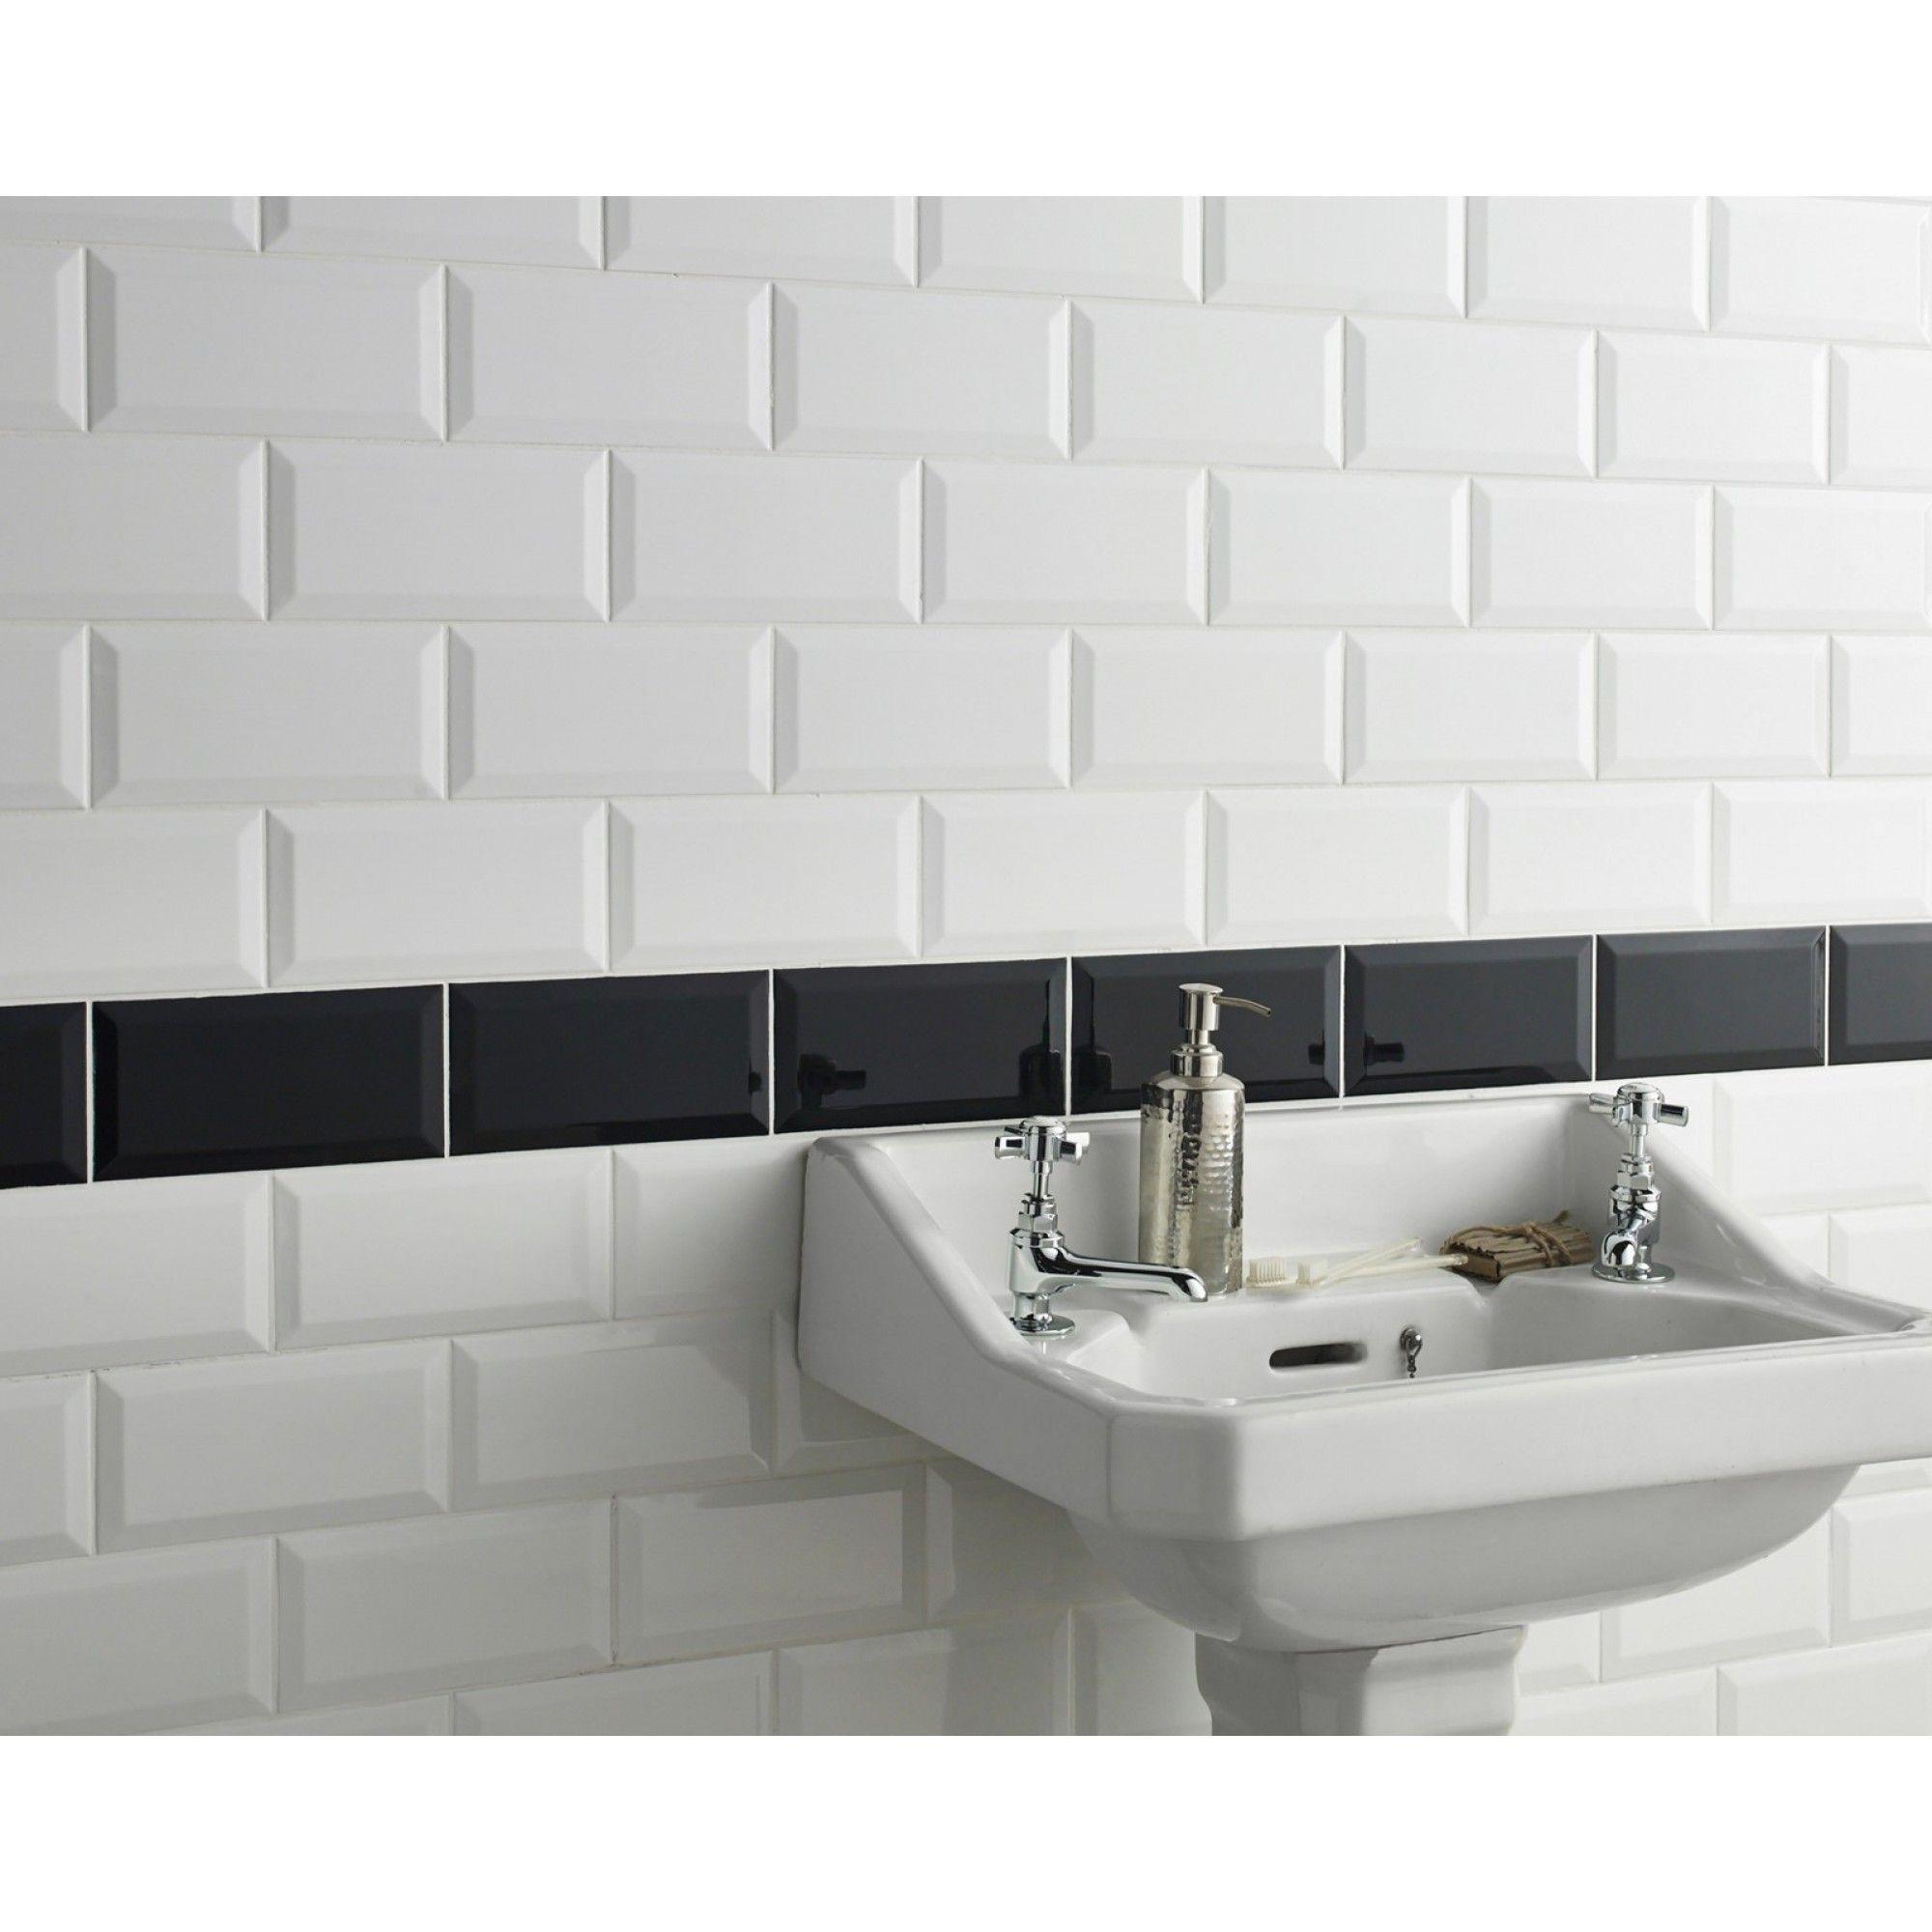 Metro White Wall Tile   White wall tiles, Wall tiles and Walls